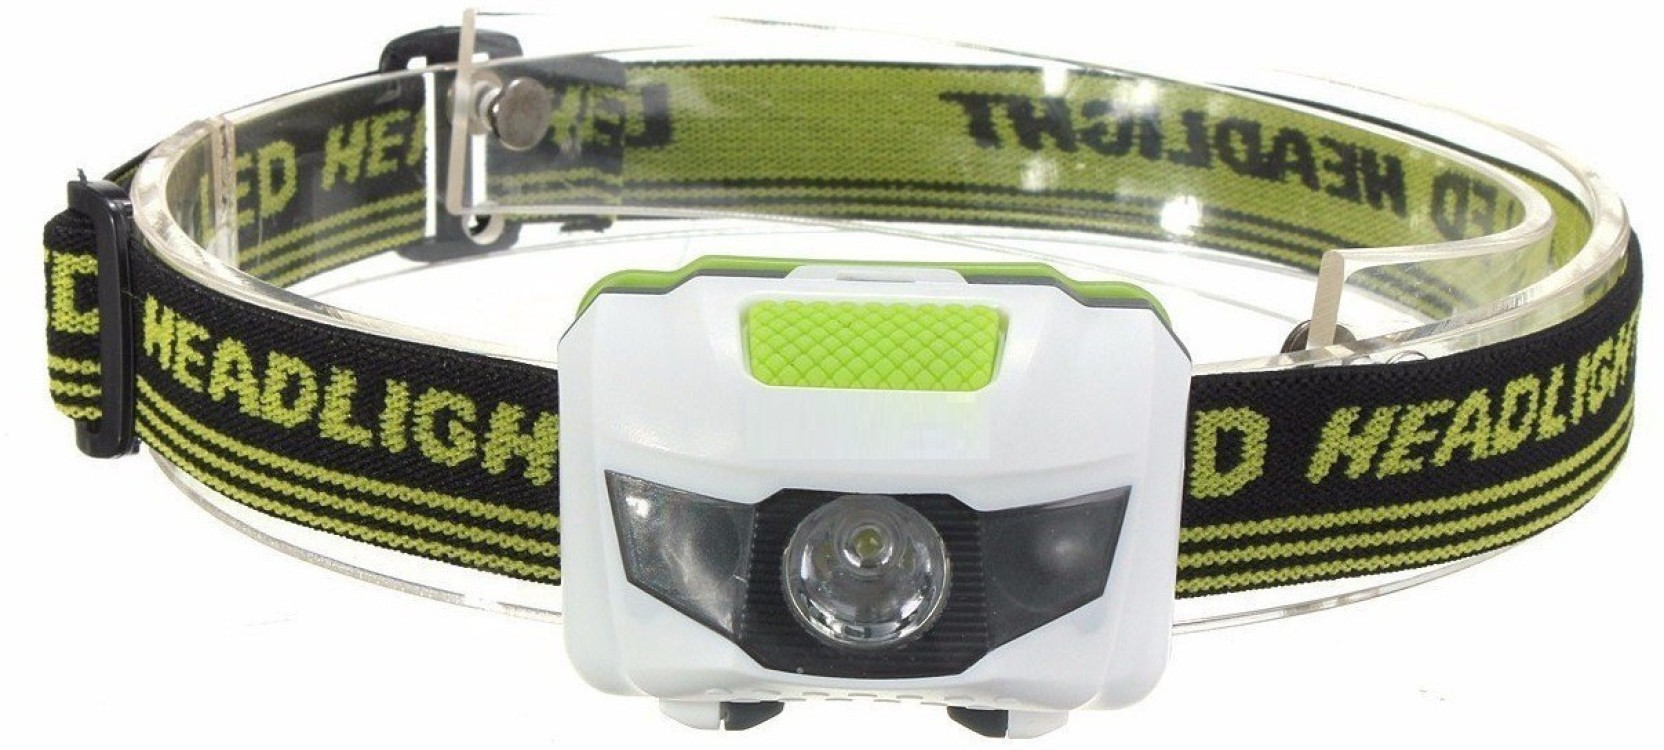 600 Lumens Outdoor COB LED Head Lamp Torch 5W Headlight Bright Adjustable Angle